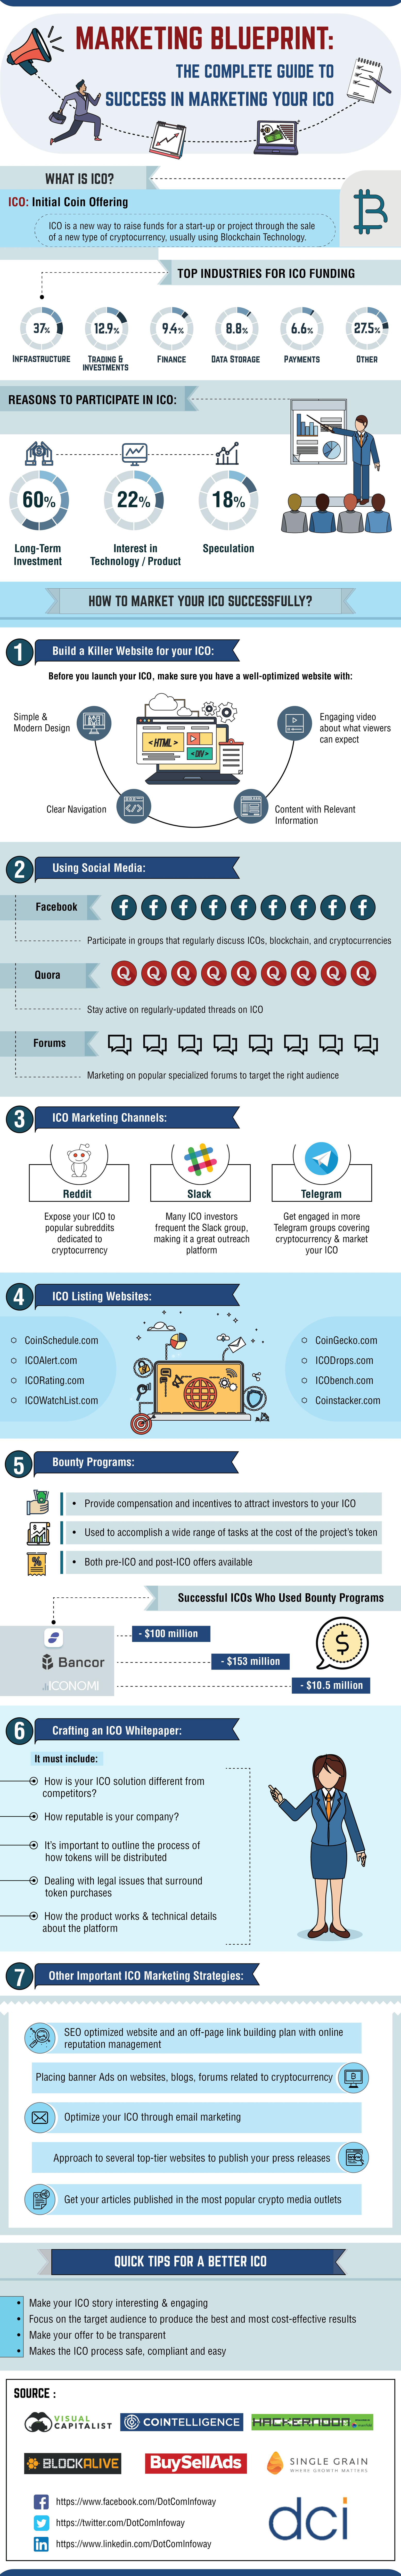 ICO Marketing Infographic